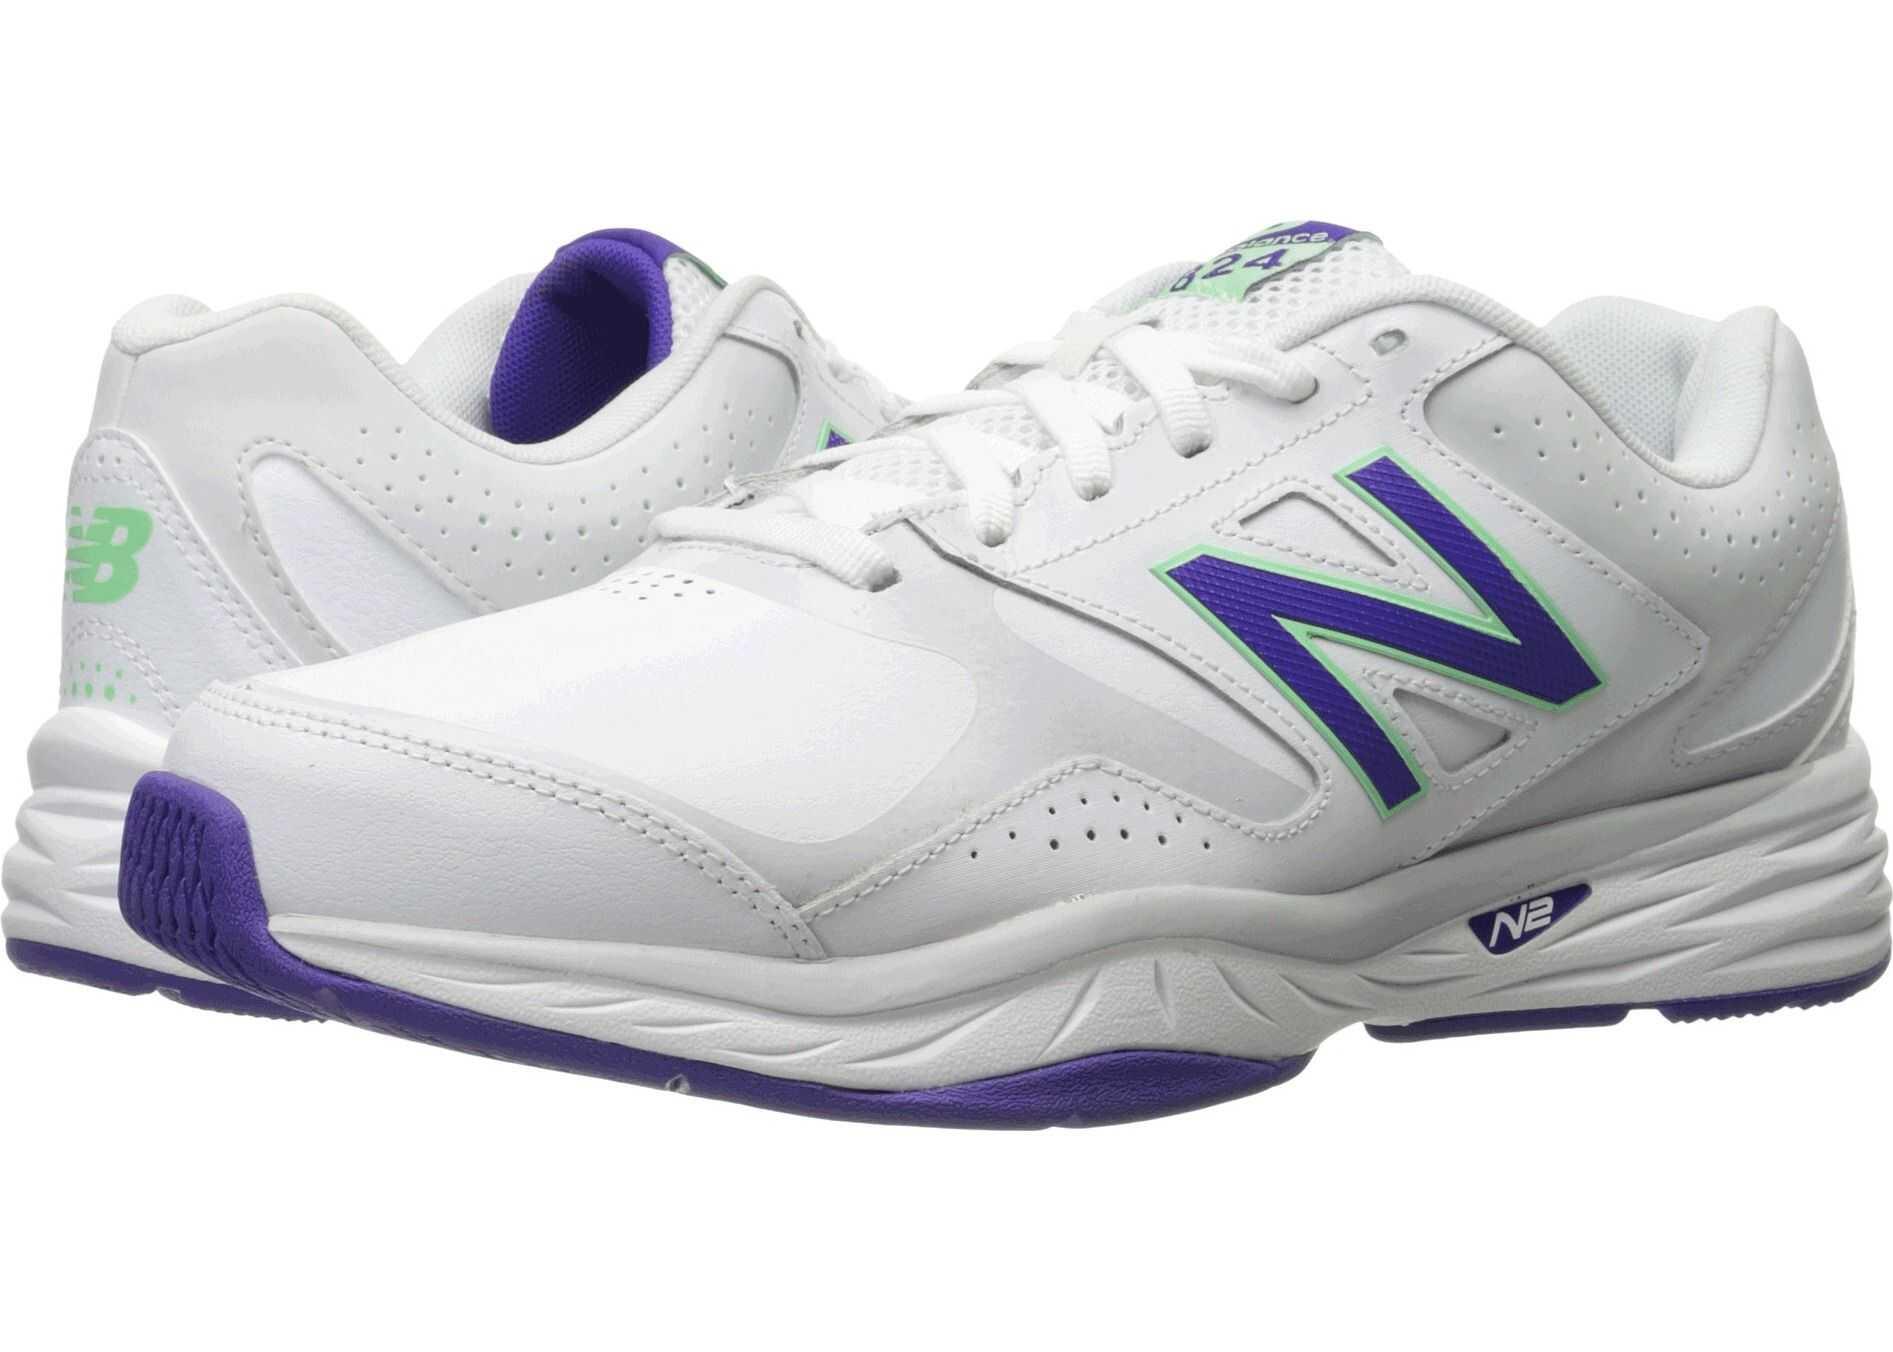 New Balance WX824v1 White/Deep Violet